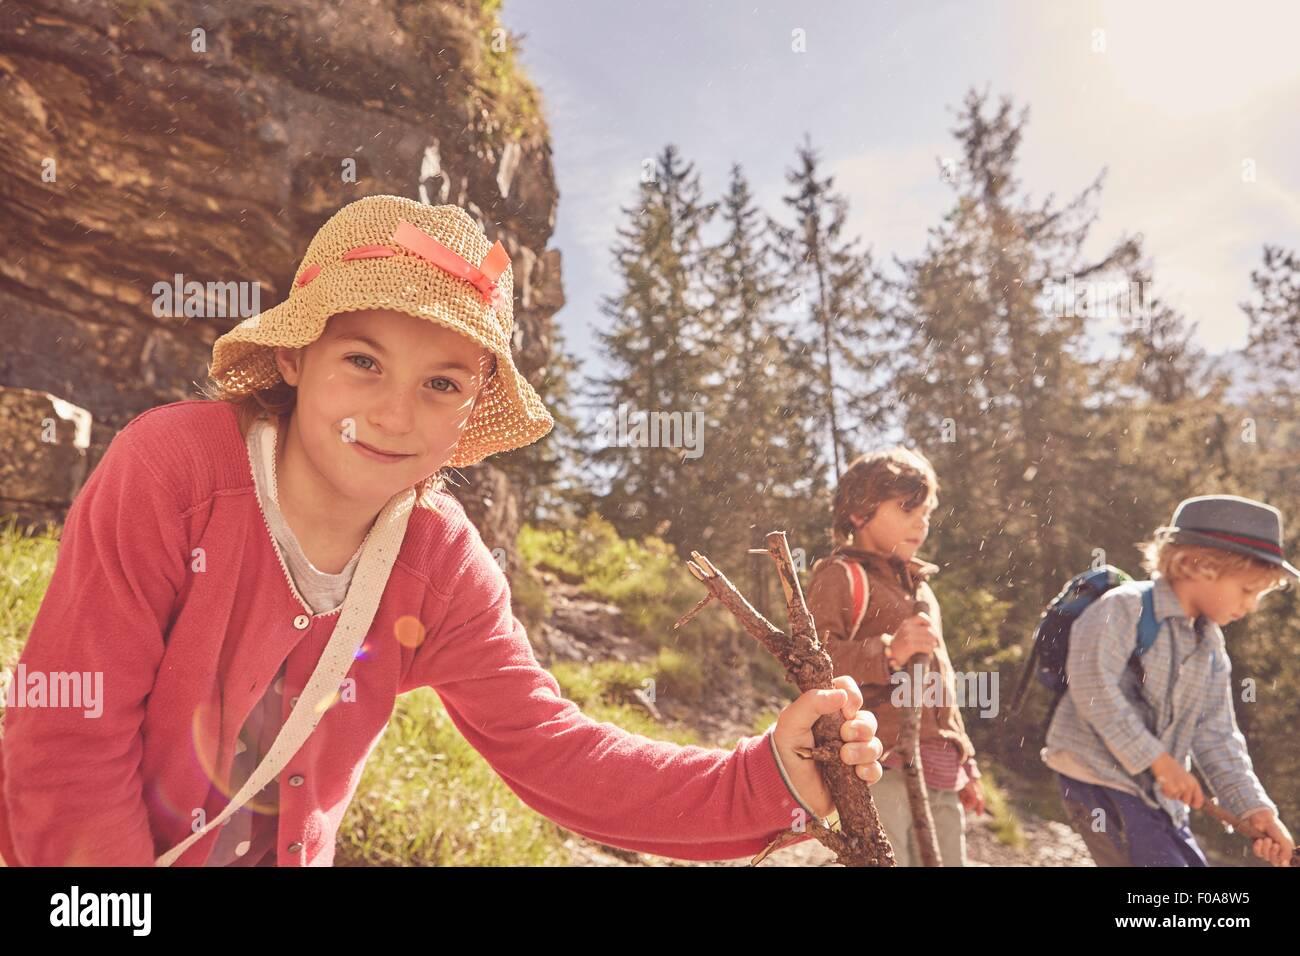 Drei Kinder erkunden Wald Stockbild